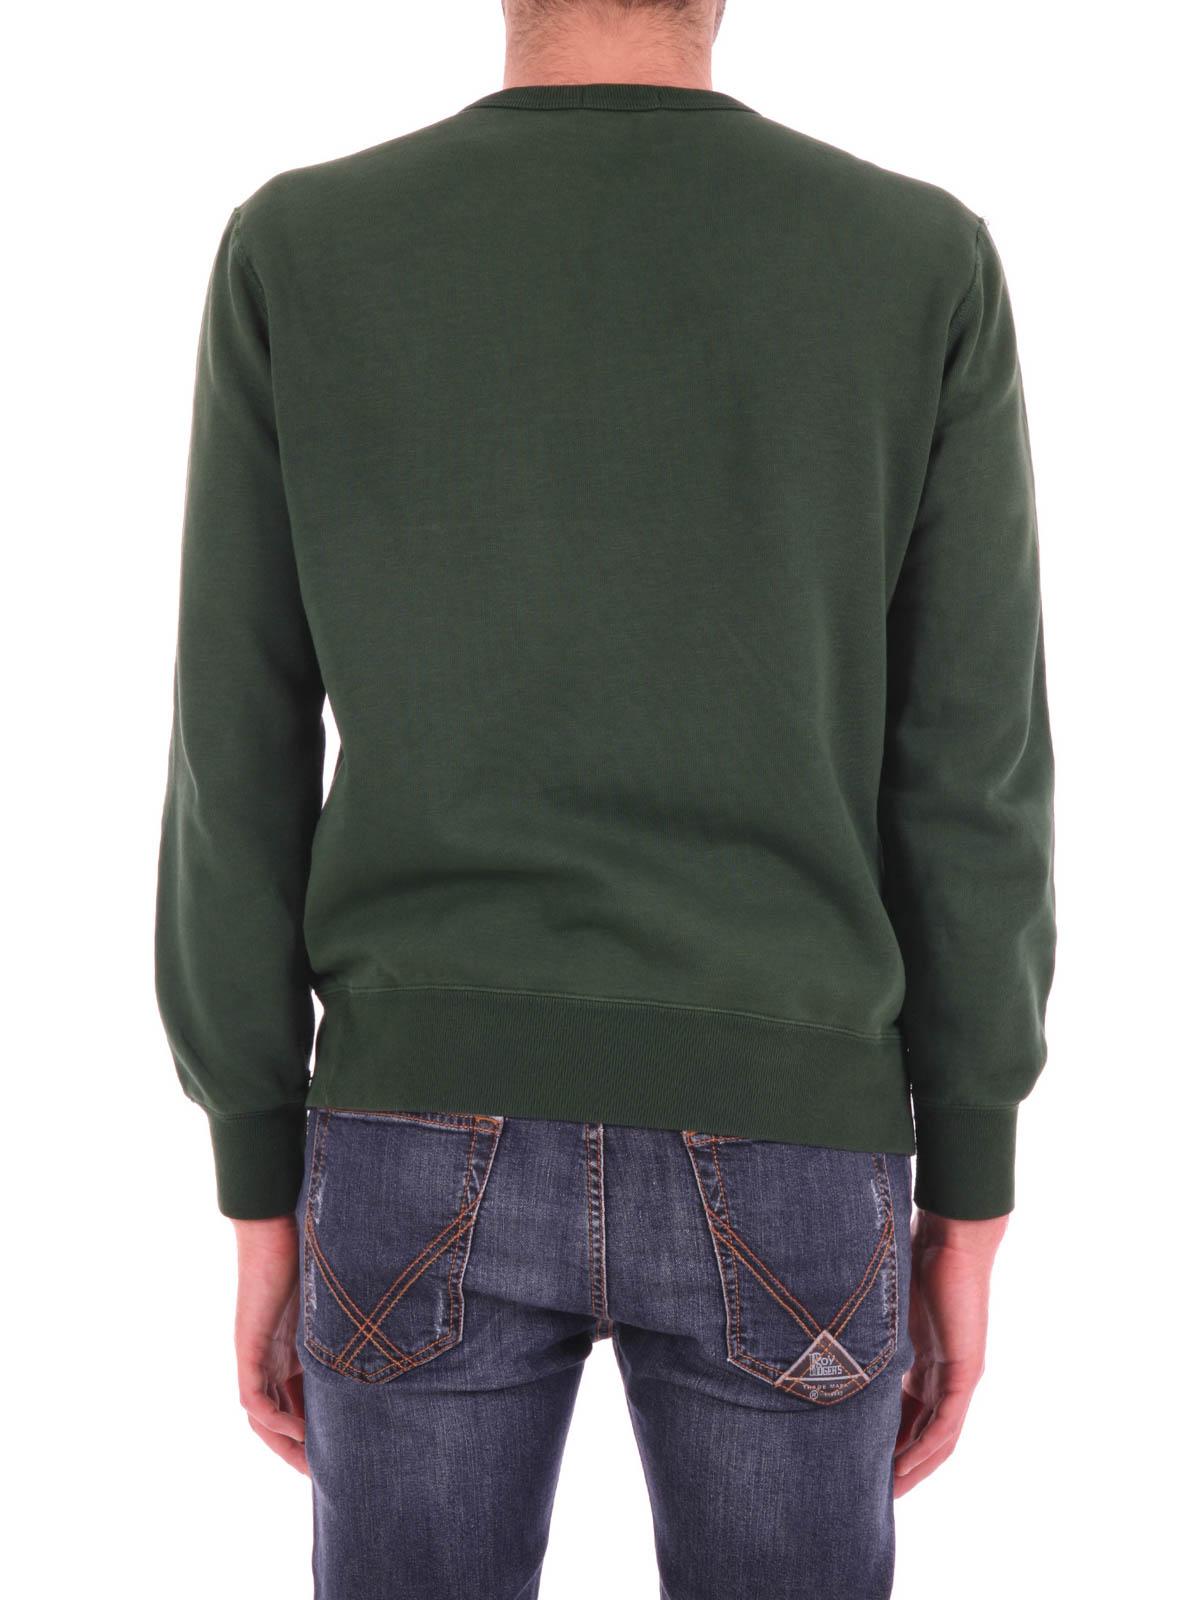 Sweat Shop Pulls Online Shirts Vert Polo Et Lauren Ralph Foncé rXarCqw